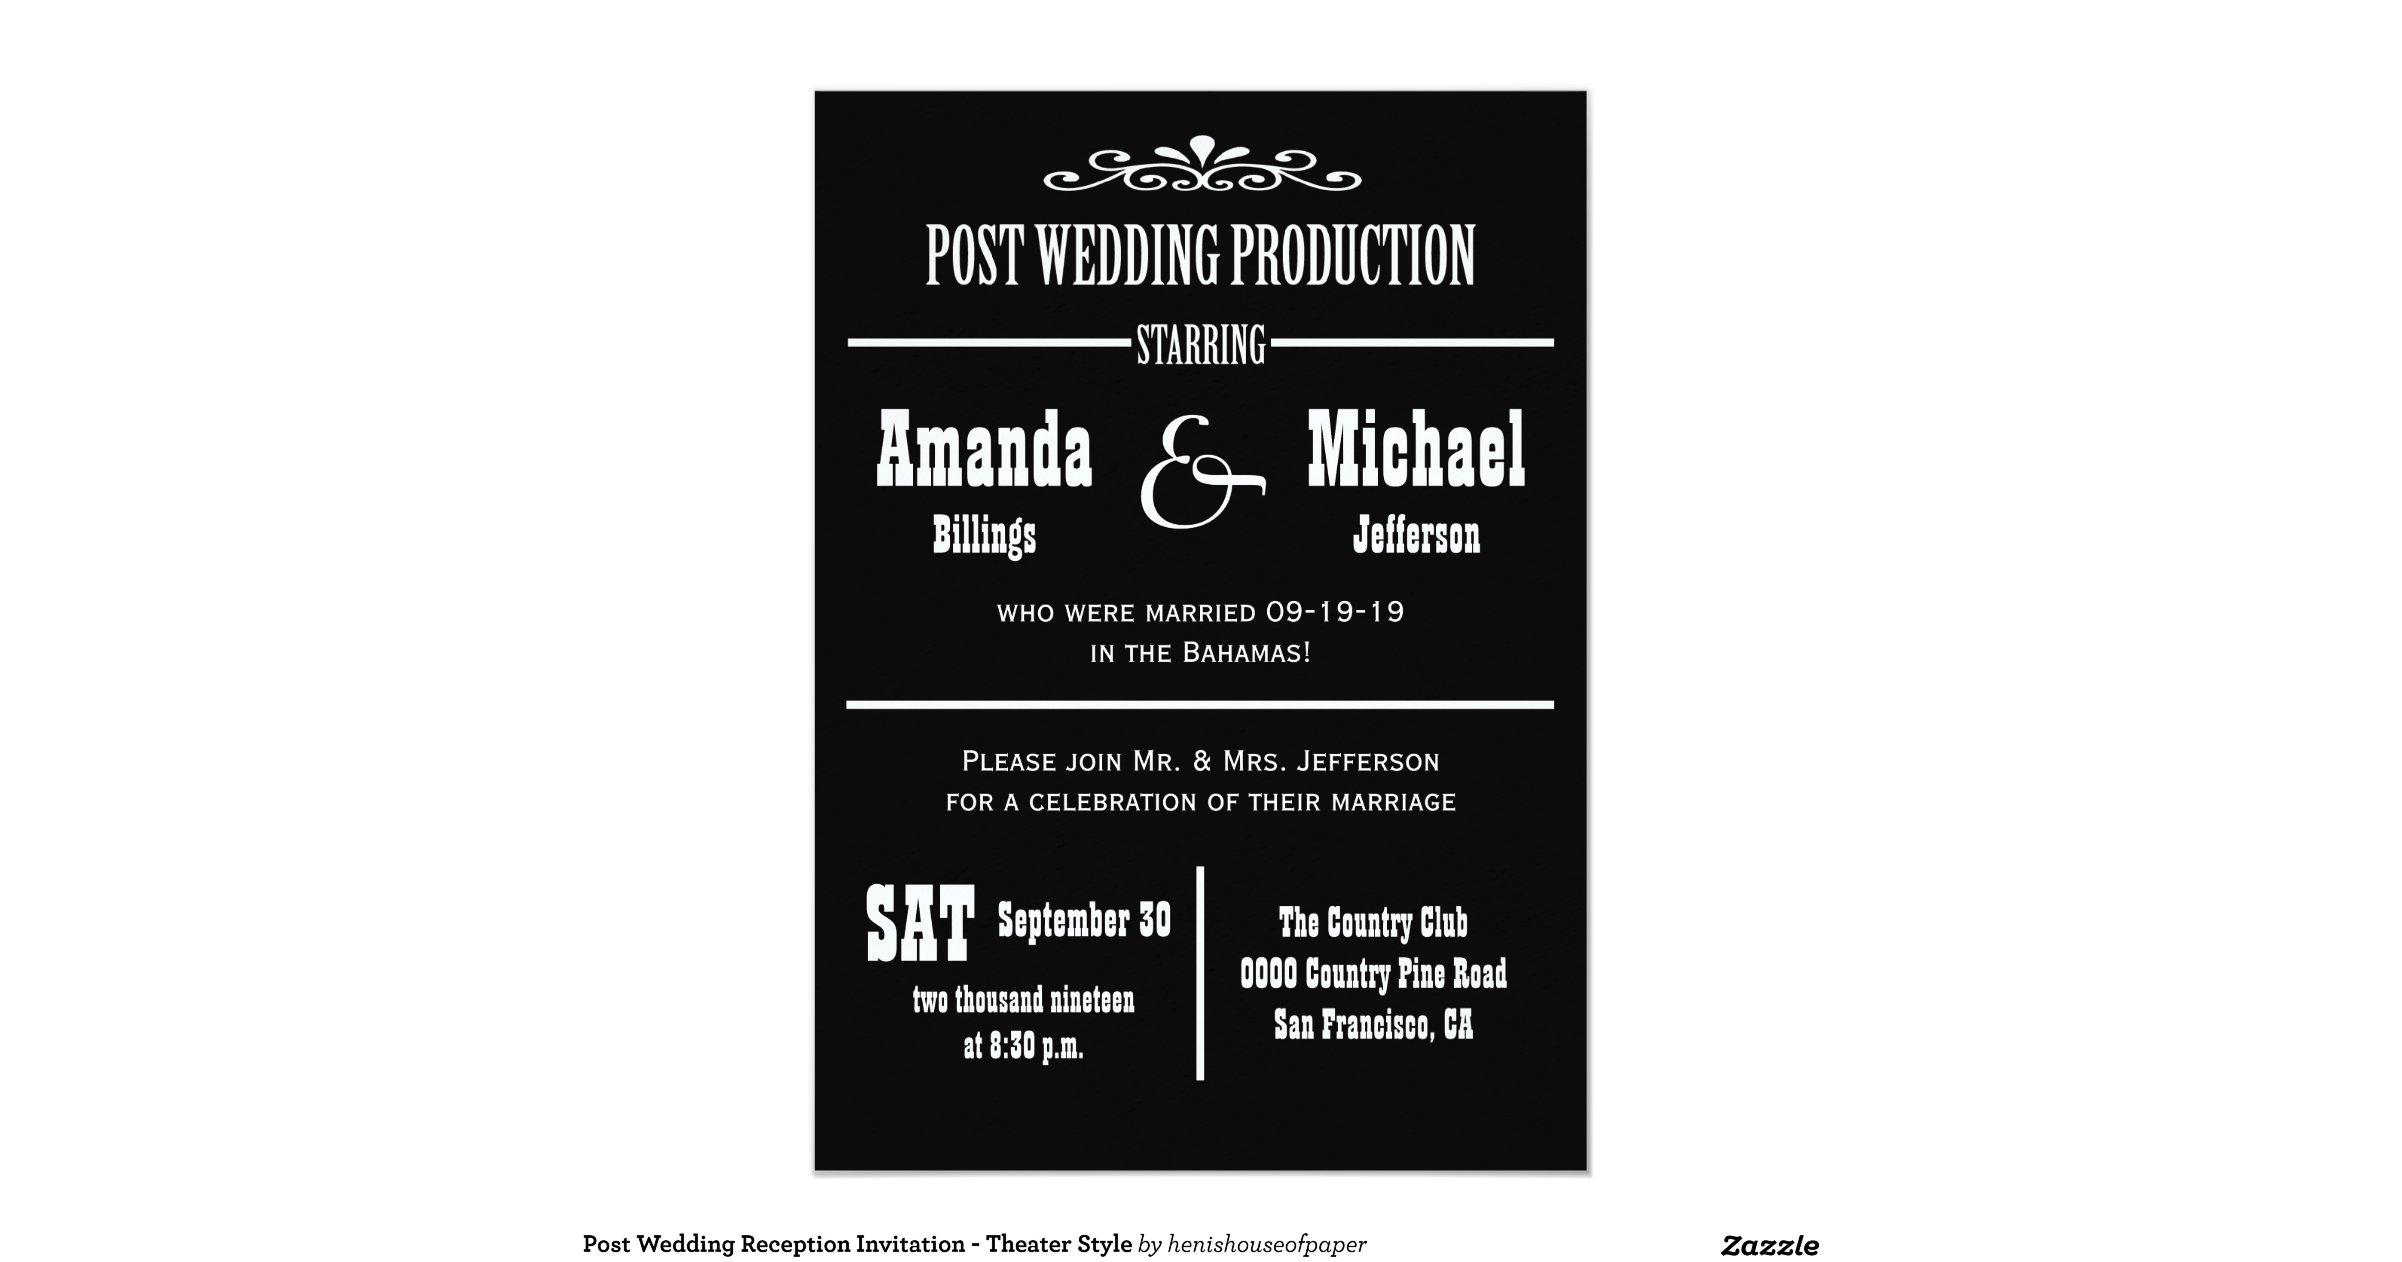 Post Wedding Invitations Reception: Post_wedding_reception_invitation_theater_style